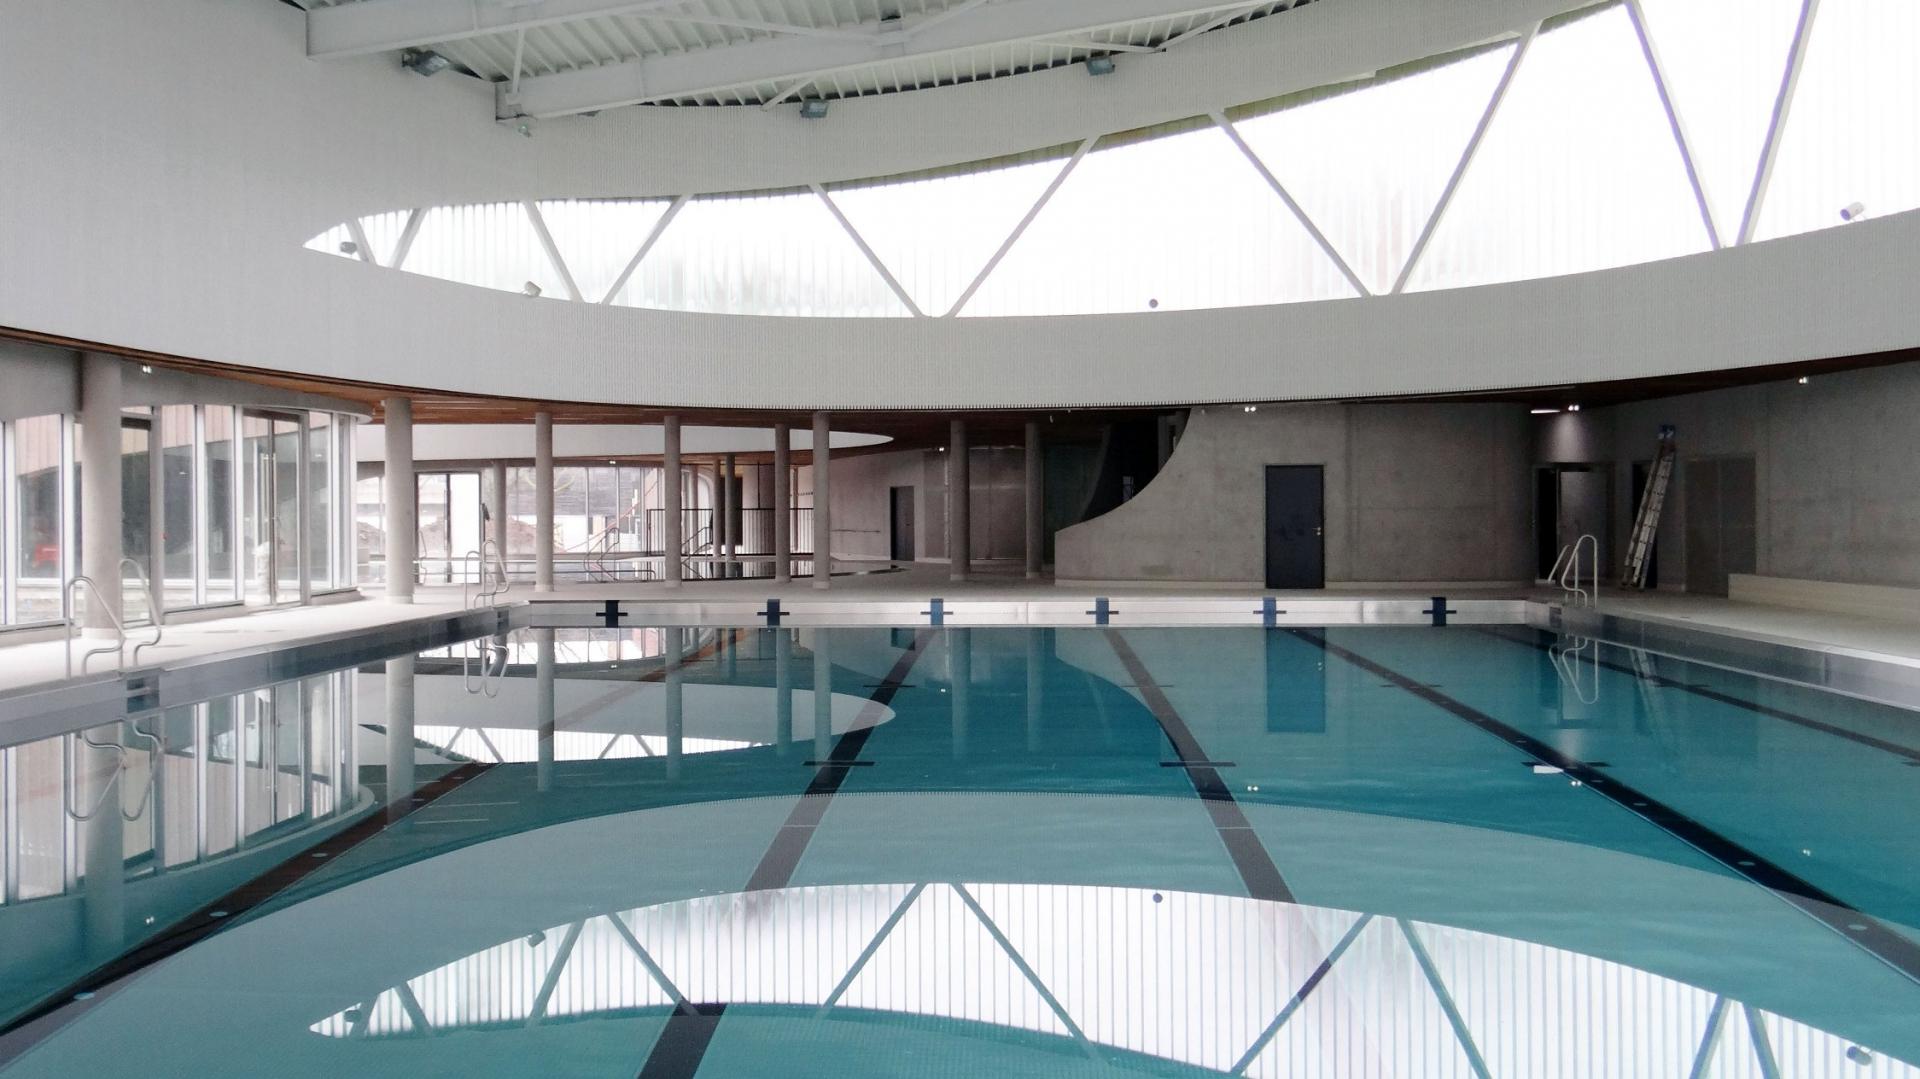 Piscine plein sud lille sud for Vestiaires piscine